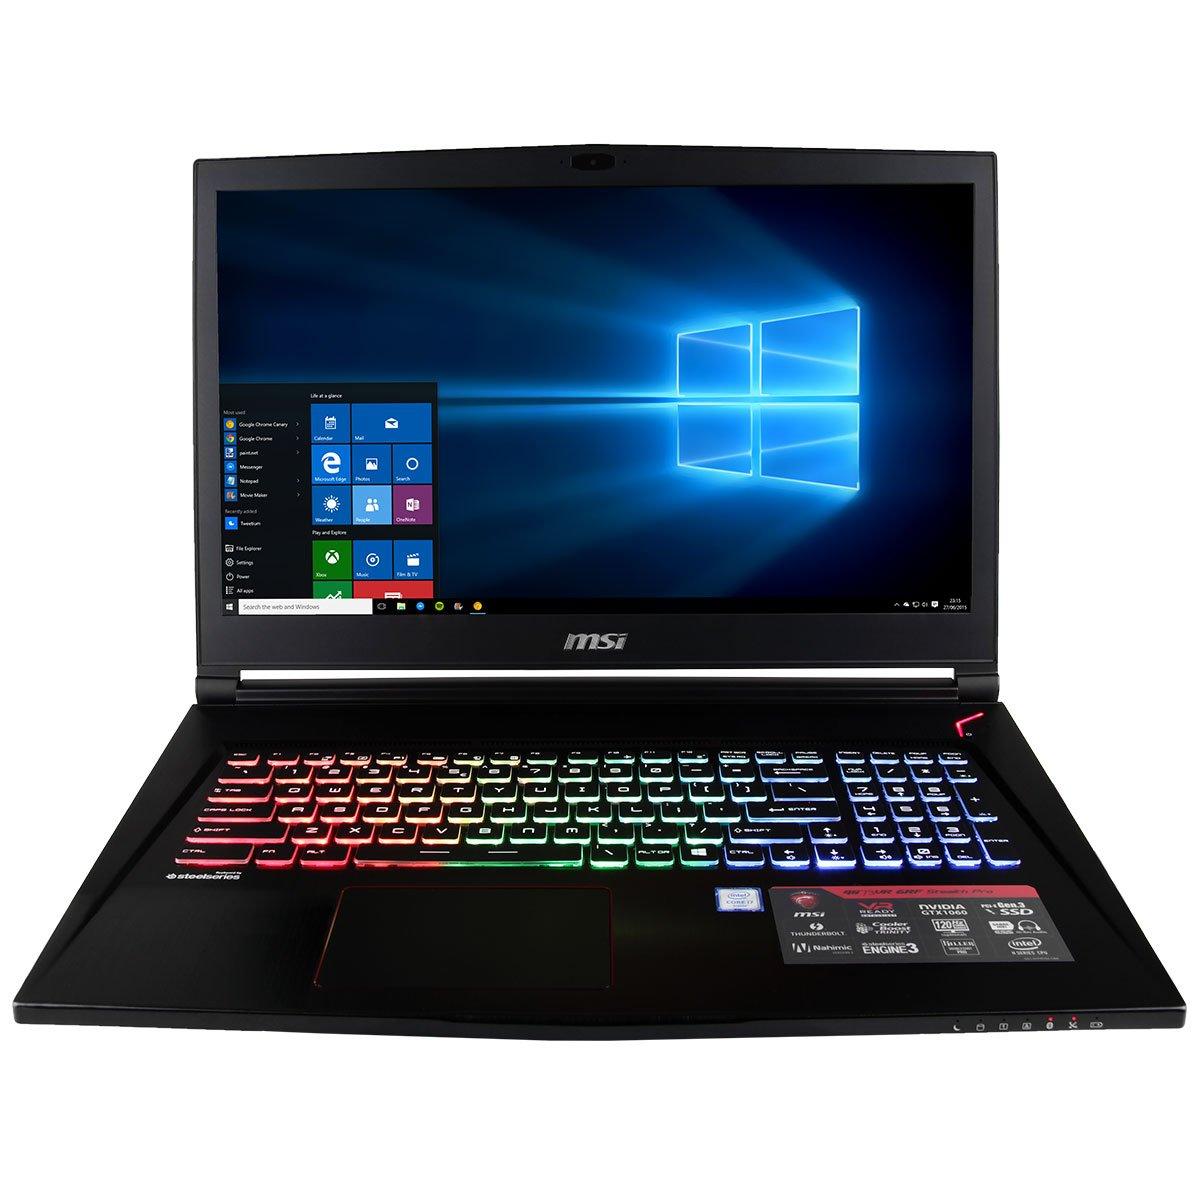 "CUK GS73VR Stealth PRO VR Ready Gamer Notebook (Intel i7-7700HQ, 32GB RAM, 1TB NVMe SSD + 2TB HDD, NVIDIA GeForce GTX 1070 8GB, 17.3"" Full HD 120Hz 5ms, Windows 10 Home) Gaming Laptop Computer"